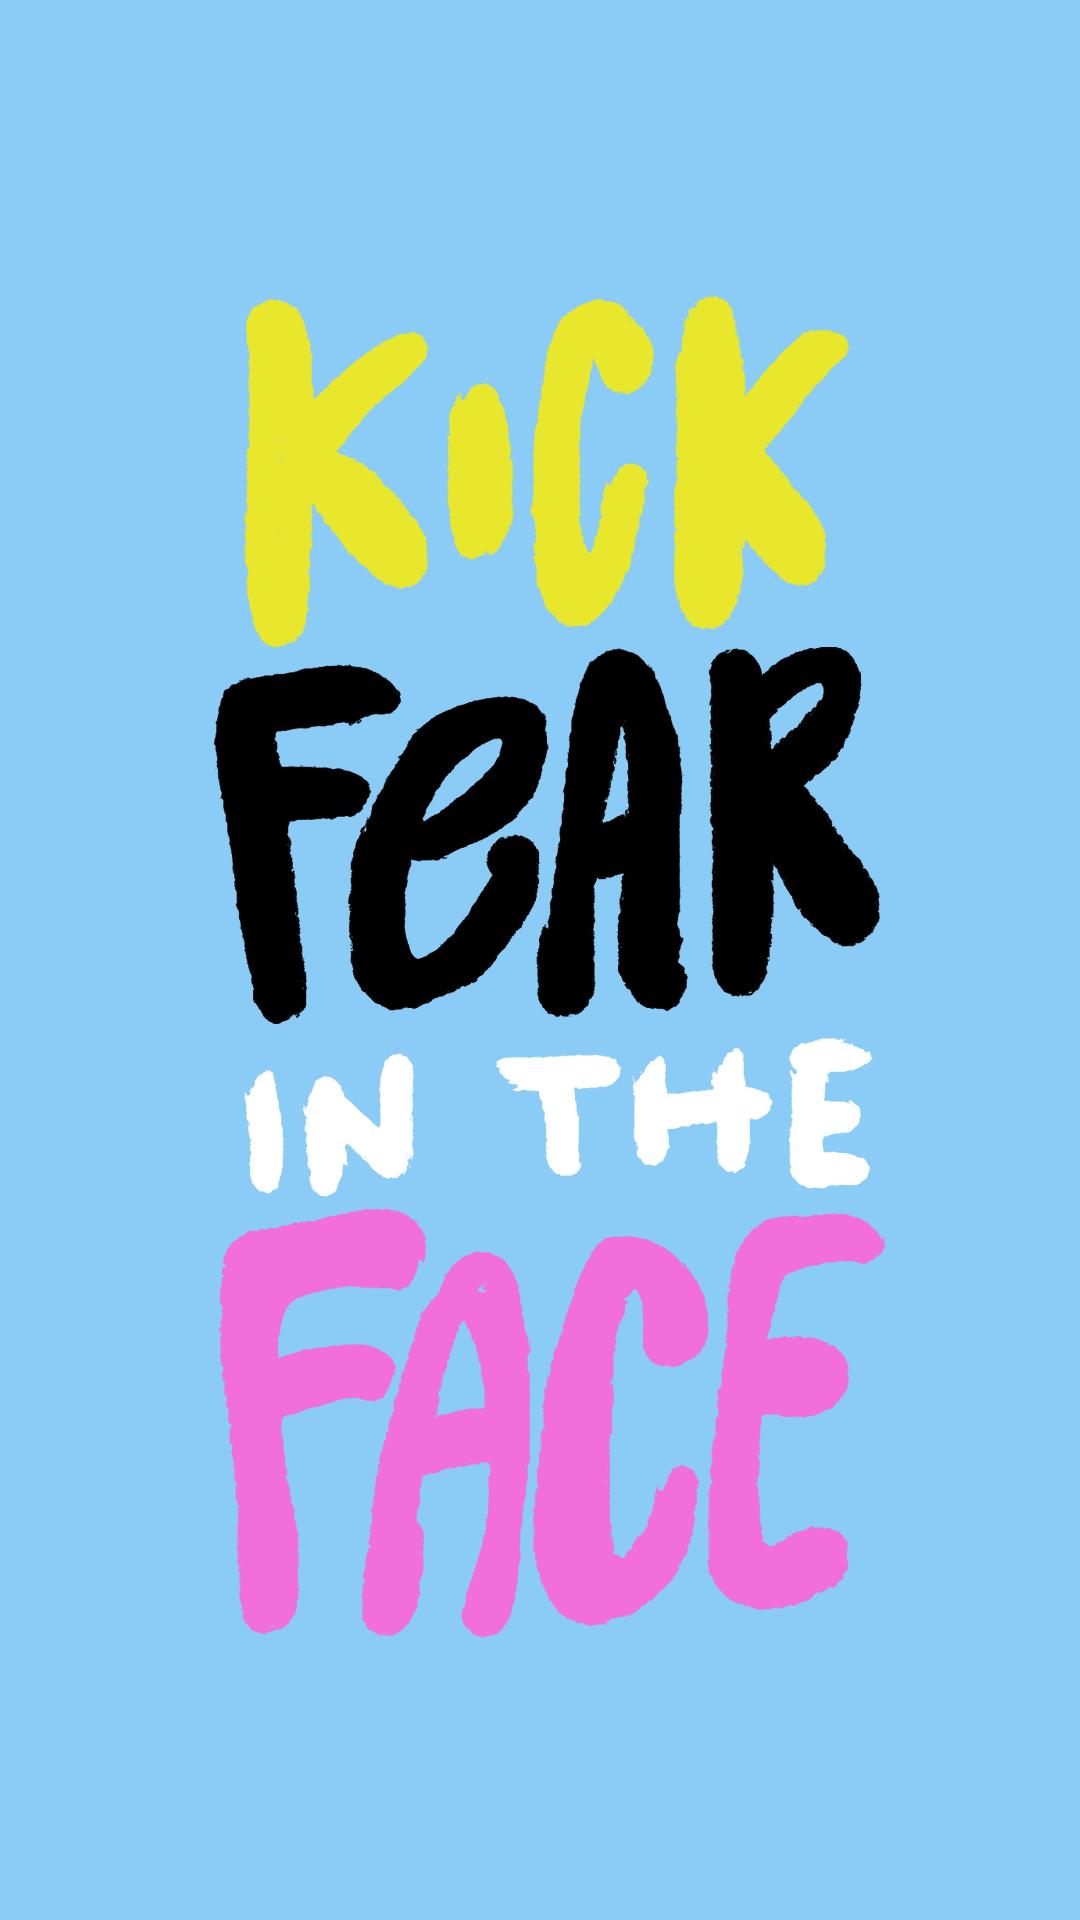 even-vanity-ends-kick-fear-blu.png